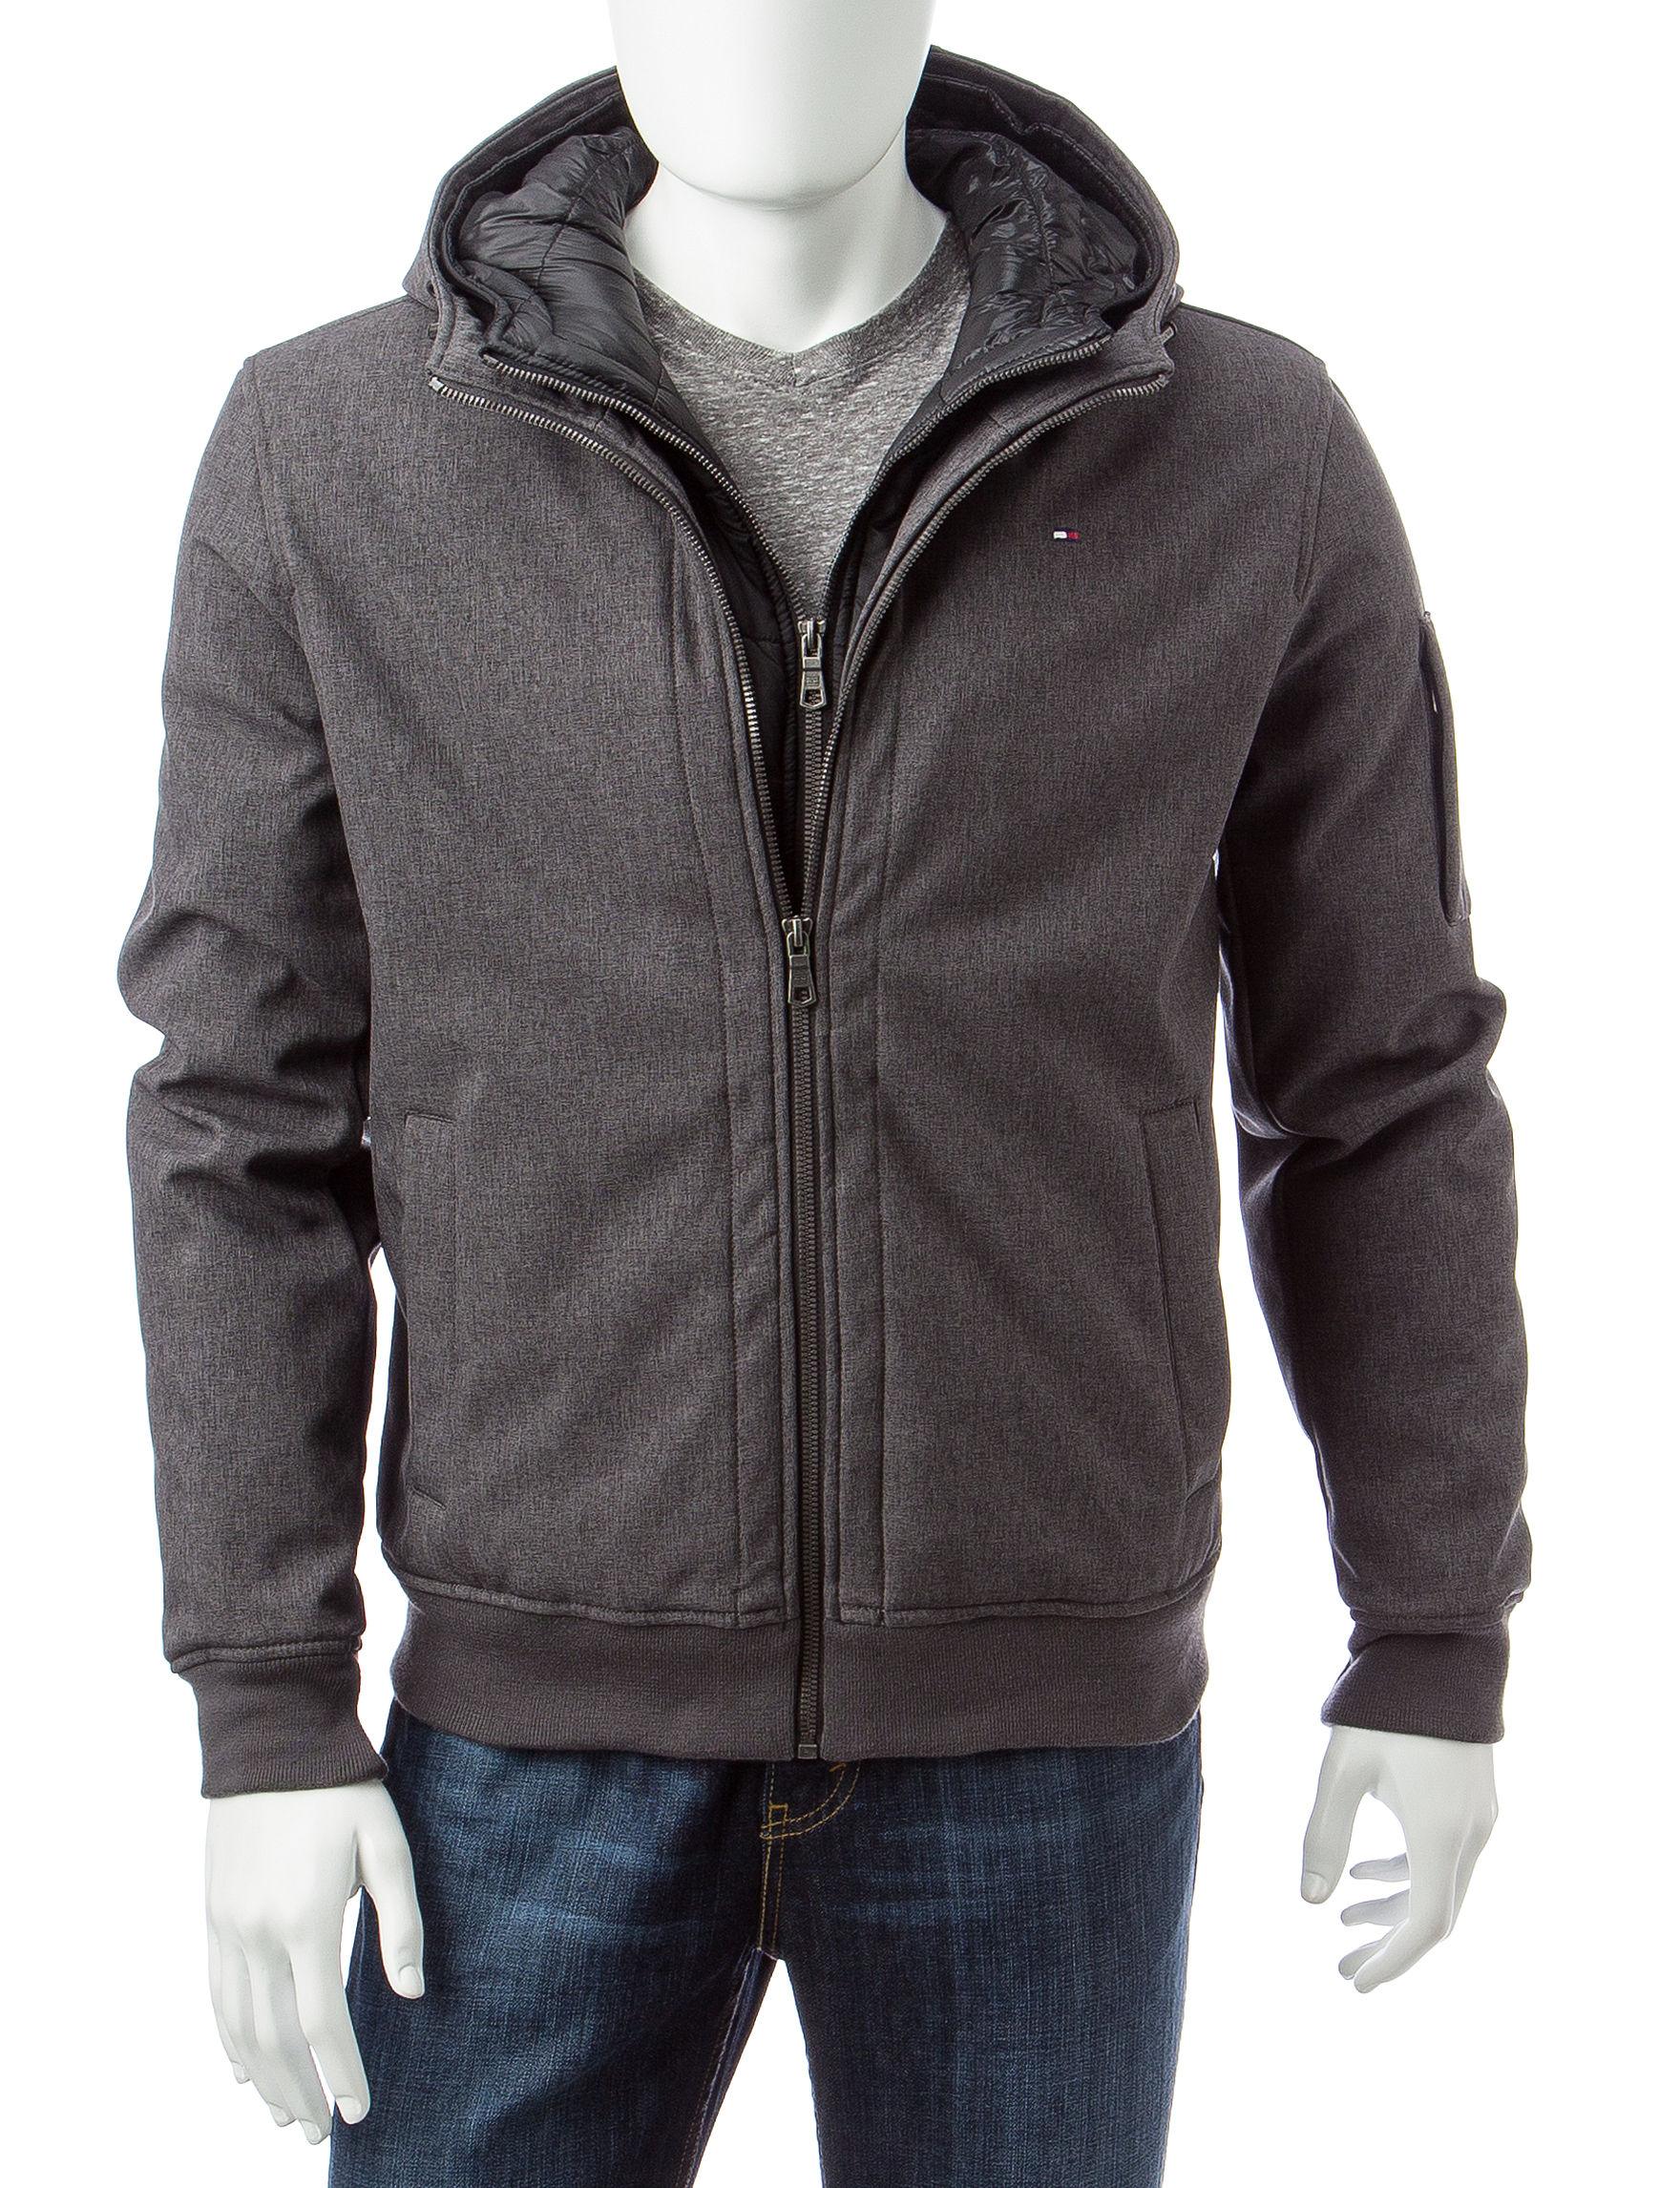 Tommy Hilfiger Charcoal Fleece & Soft Shell Jackets